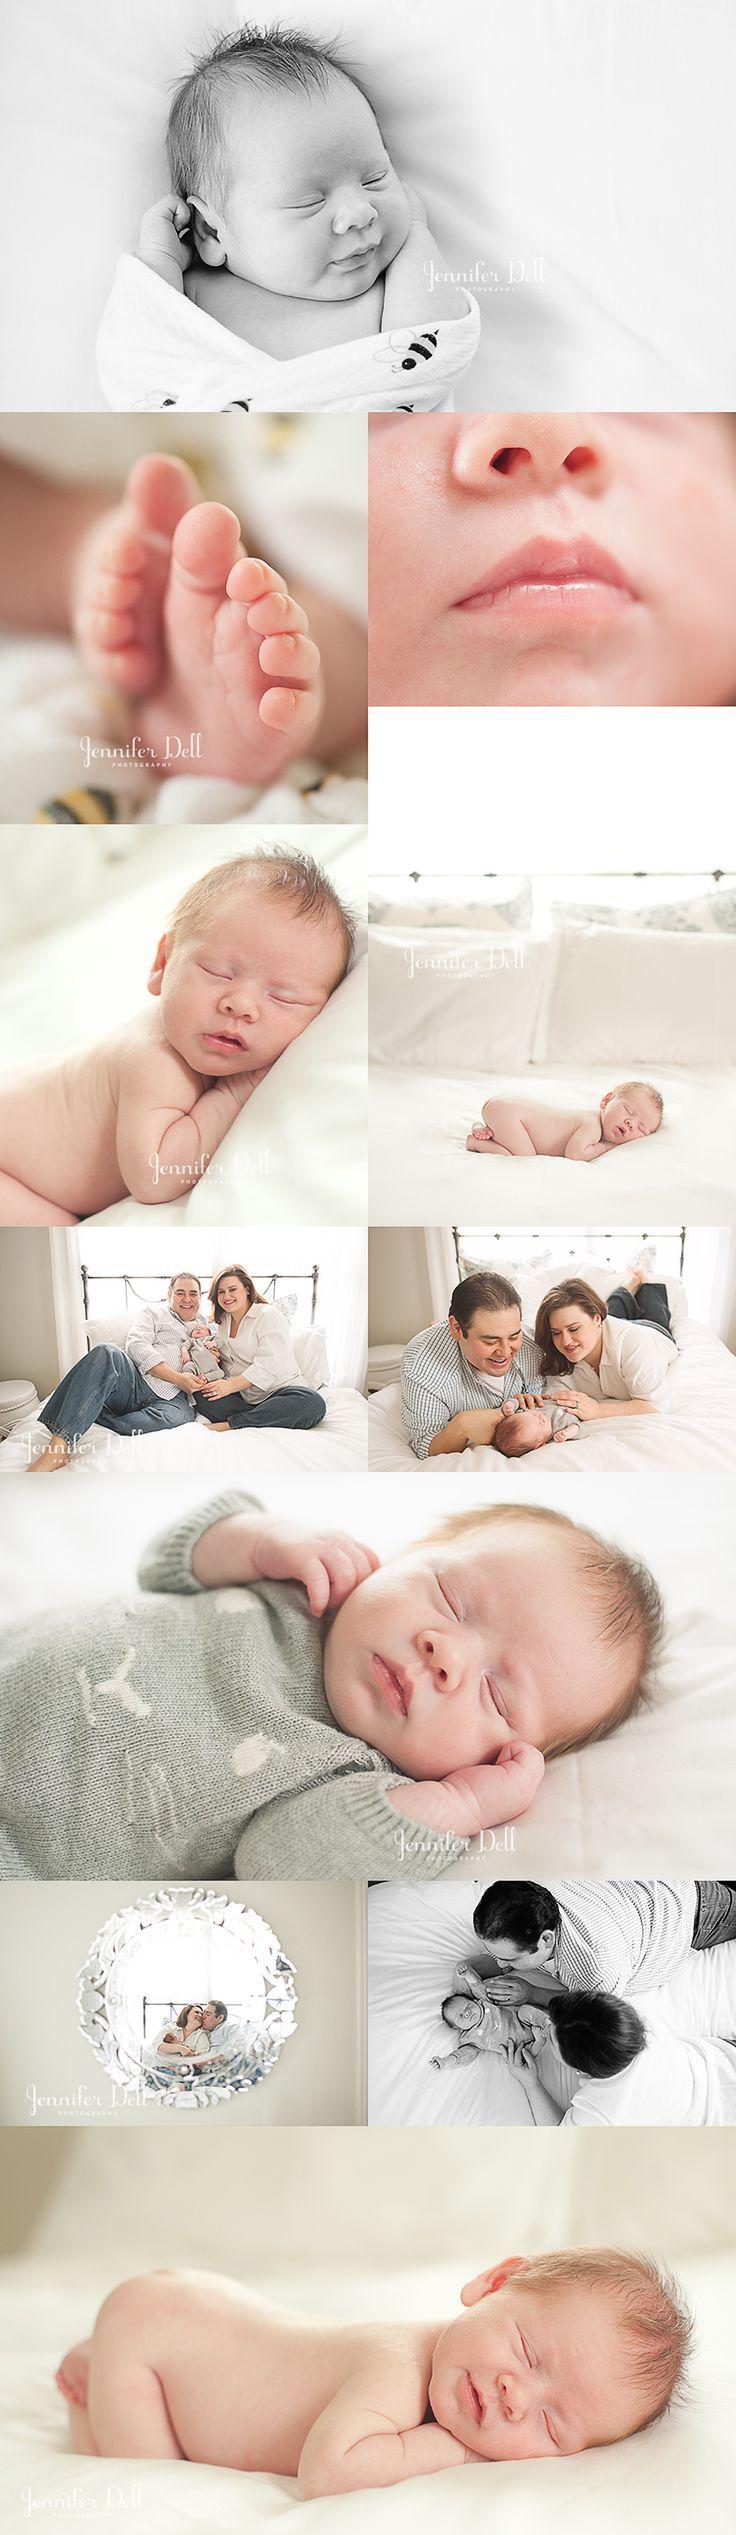 Cool sleepy smiles houston newborn photographer https www amazon com